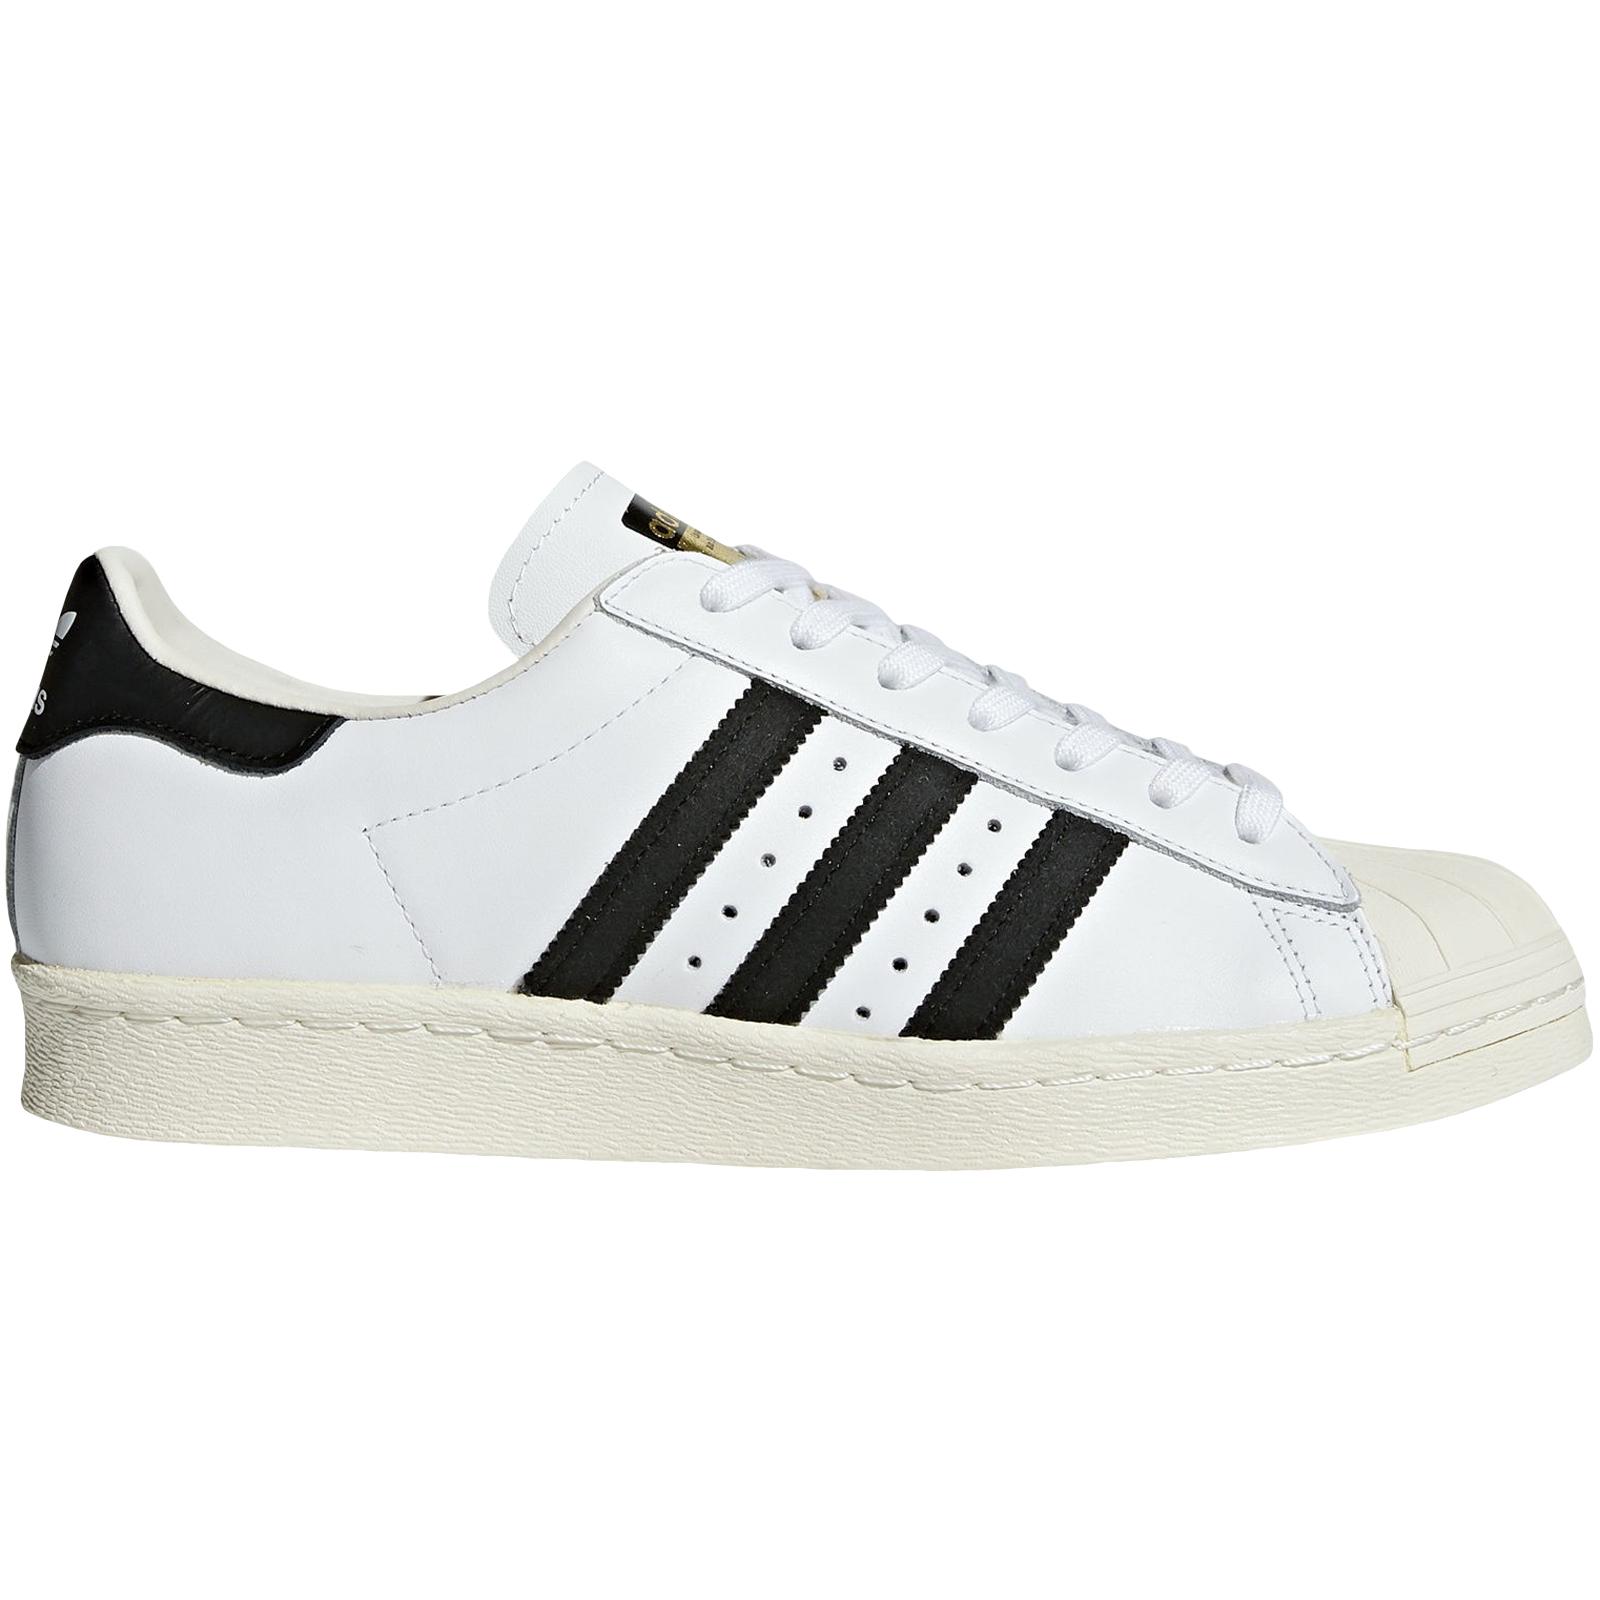 Cheap Adidas Originals Men's Superstar Adicolor Fashion Sneaker